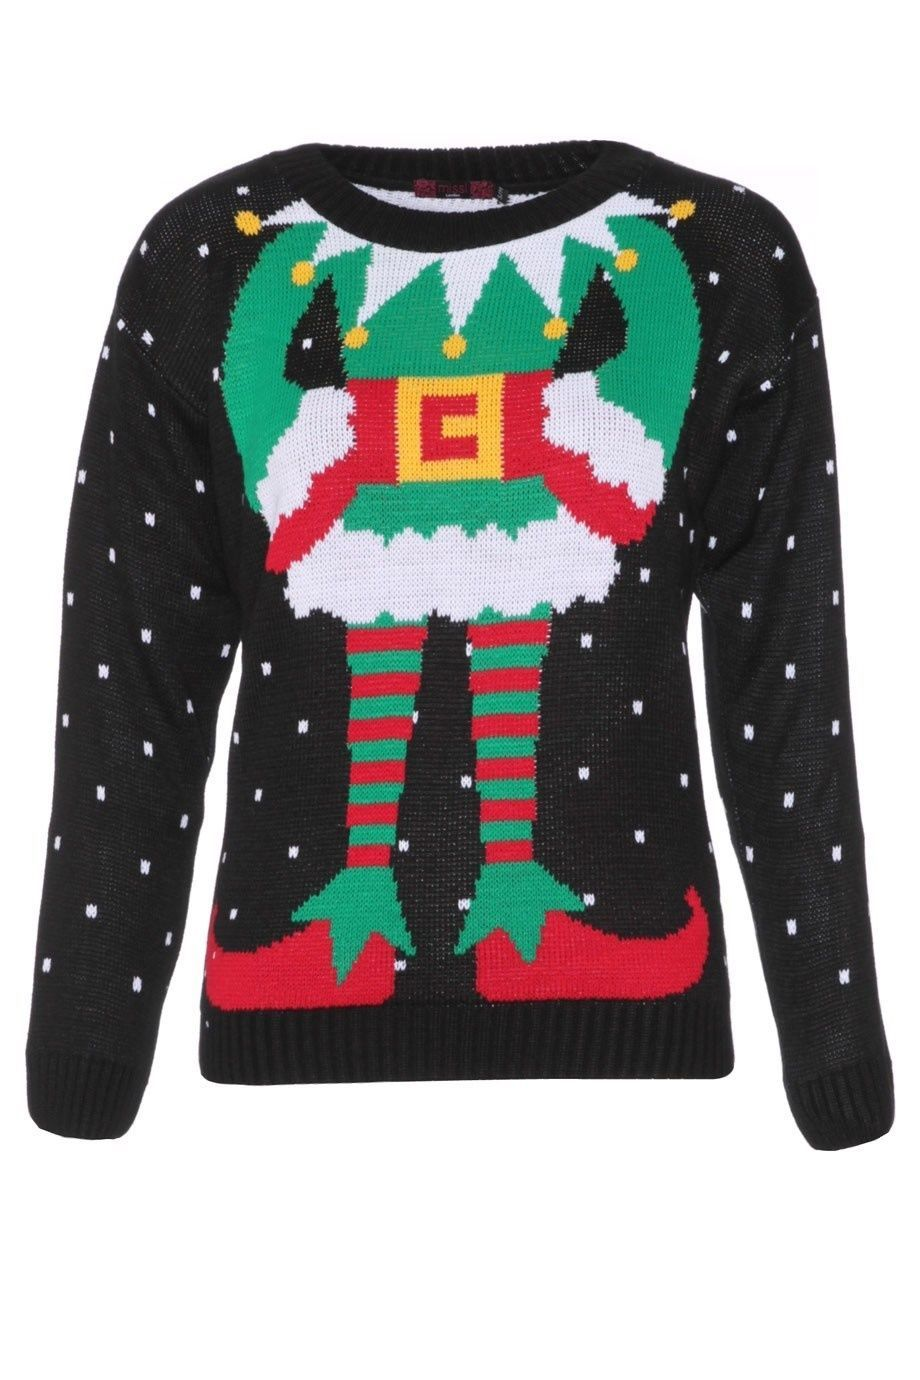 ELF CHRISTMAS T-SHIRT FOR WOMEN FUNNY XMAS DESIGN JUMPER FESTIVE NOVELTY LADIES